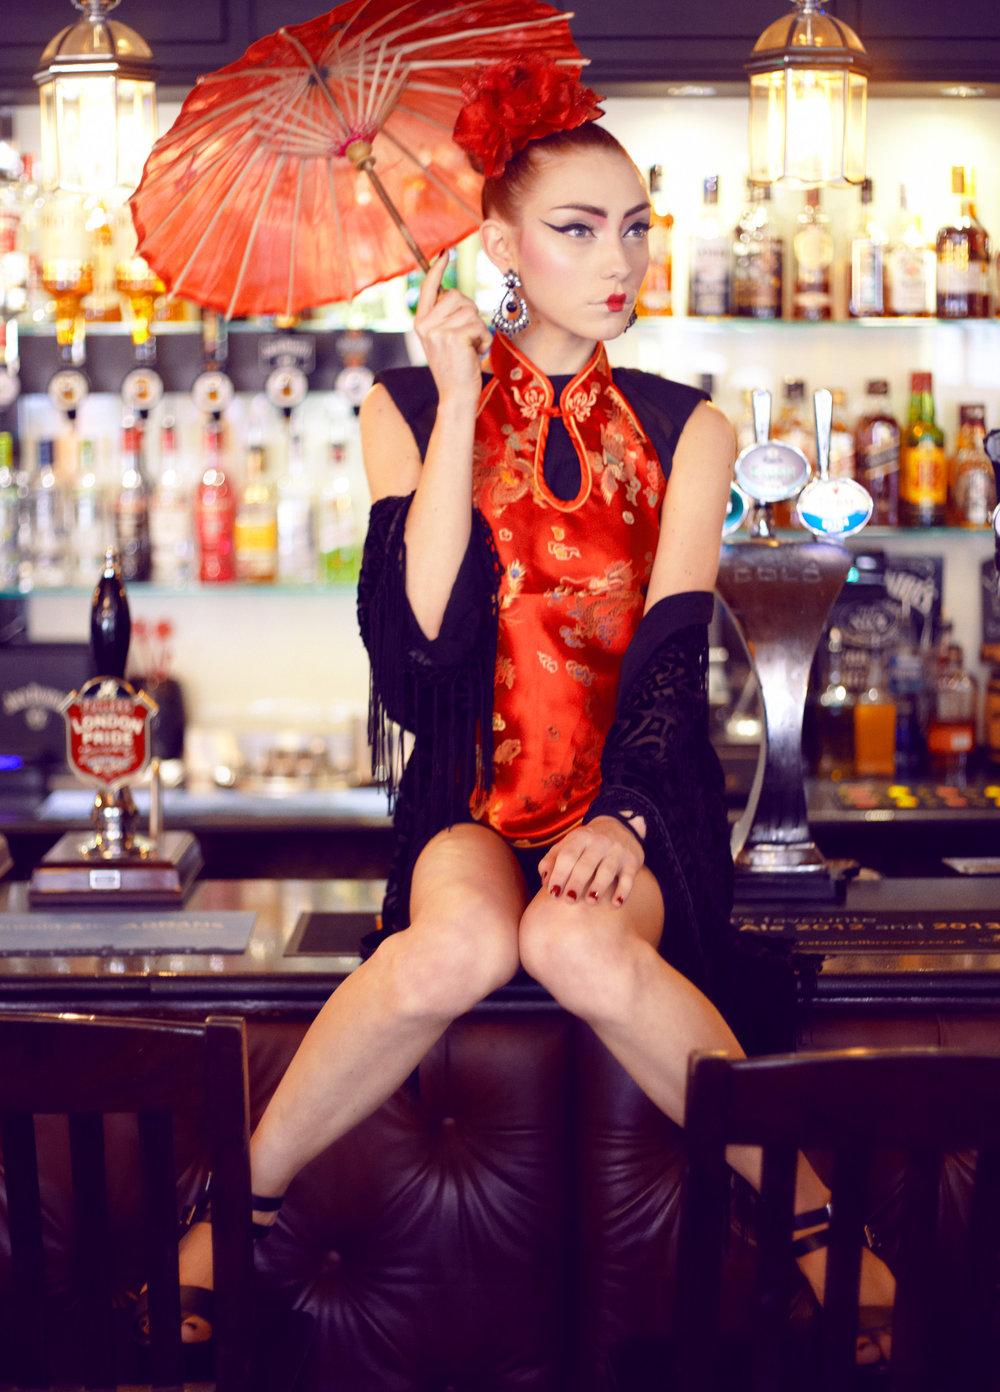 JC-GEISHA---RIO-DEBOLLA-Models1UK-Melissa-Uren-Photography-FEB-2014-LOOK-30623-FINAL-WEB-V2.jpg